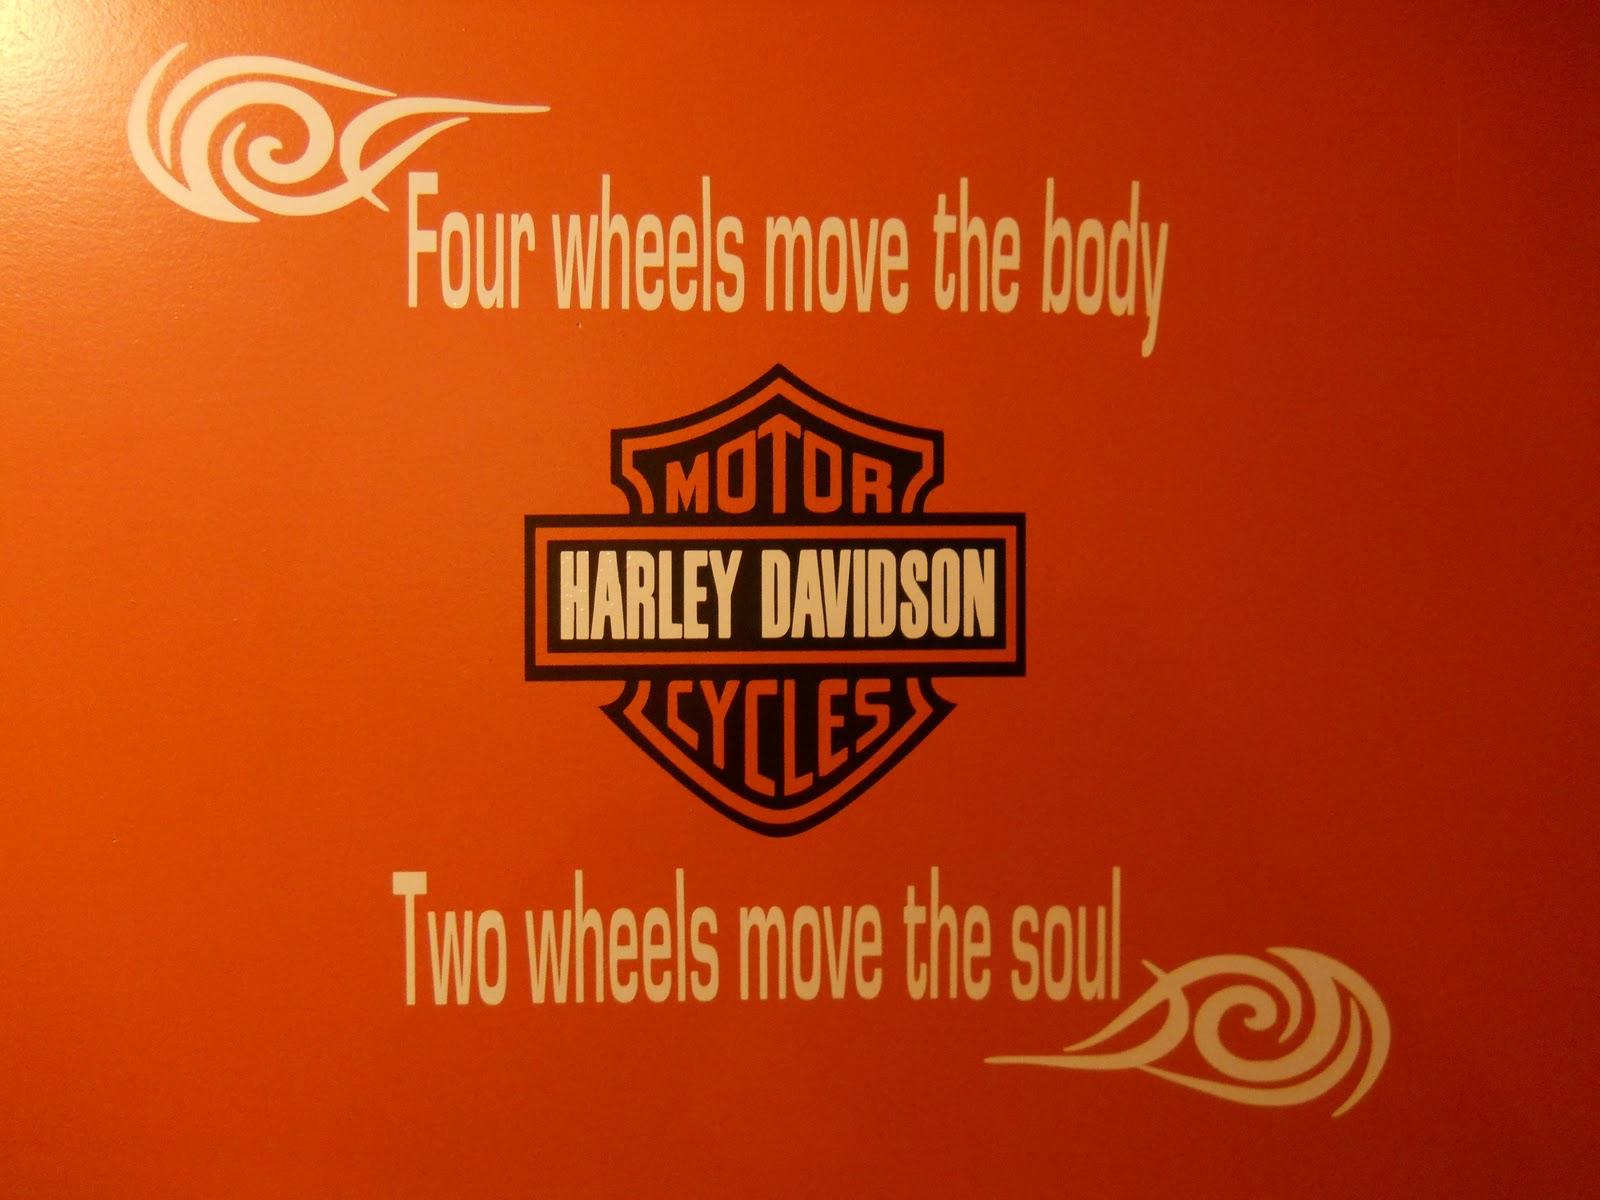 166 Best Images About Harley Davidson On Pinterest: Harley Davidson On Pinterest